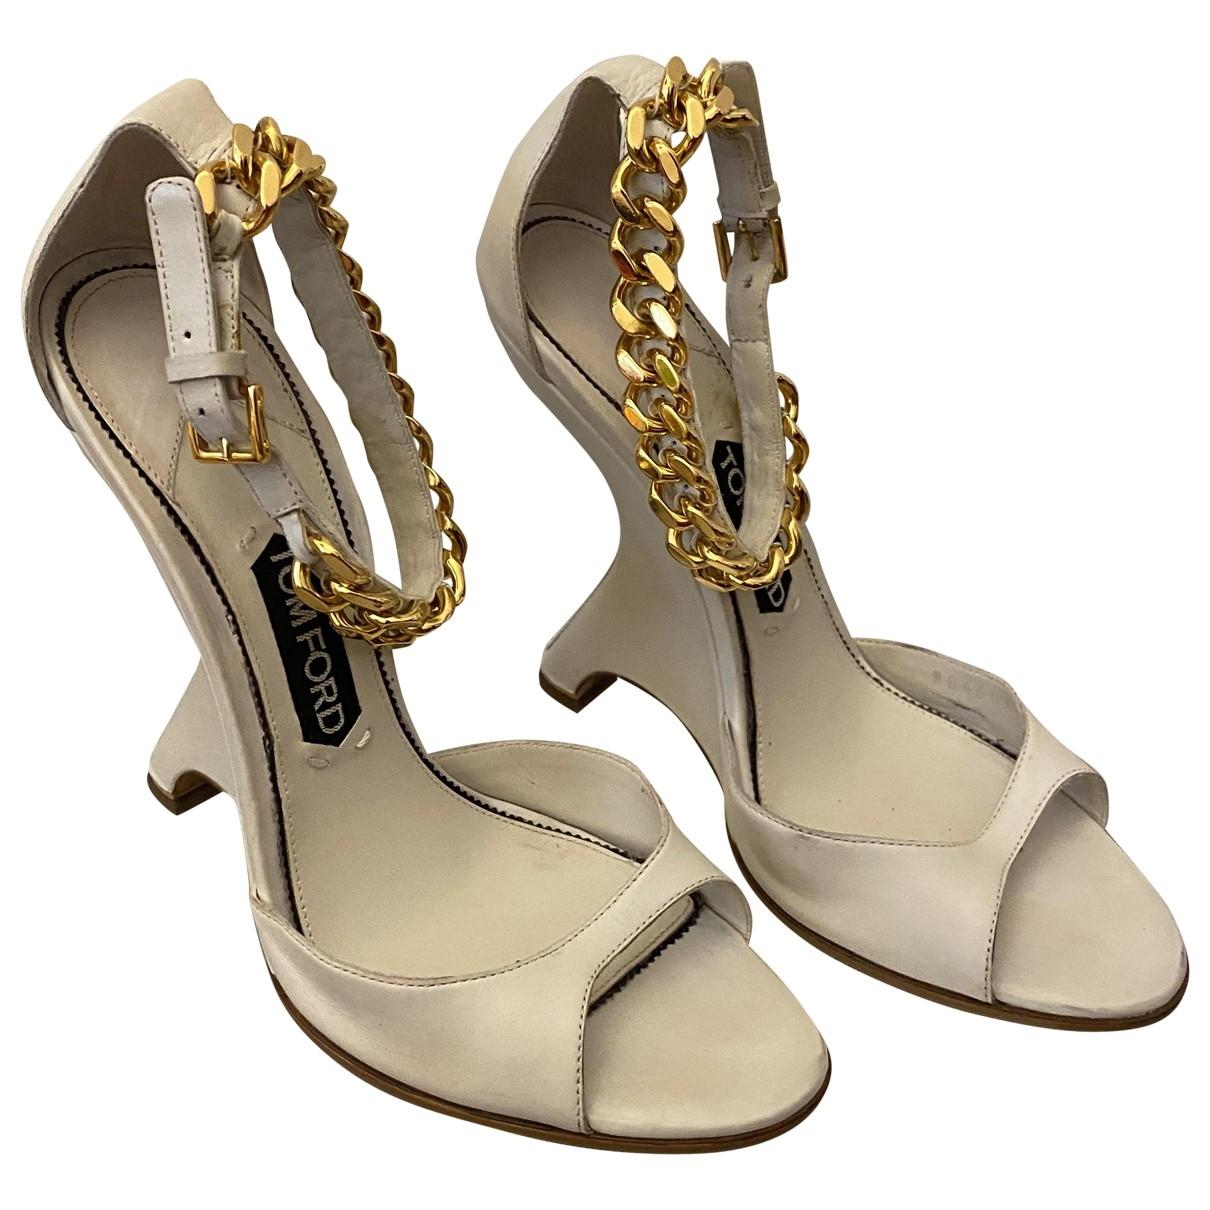 Sandalias de Cuero Tom Ford